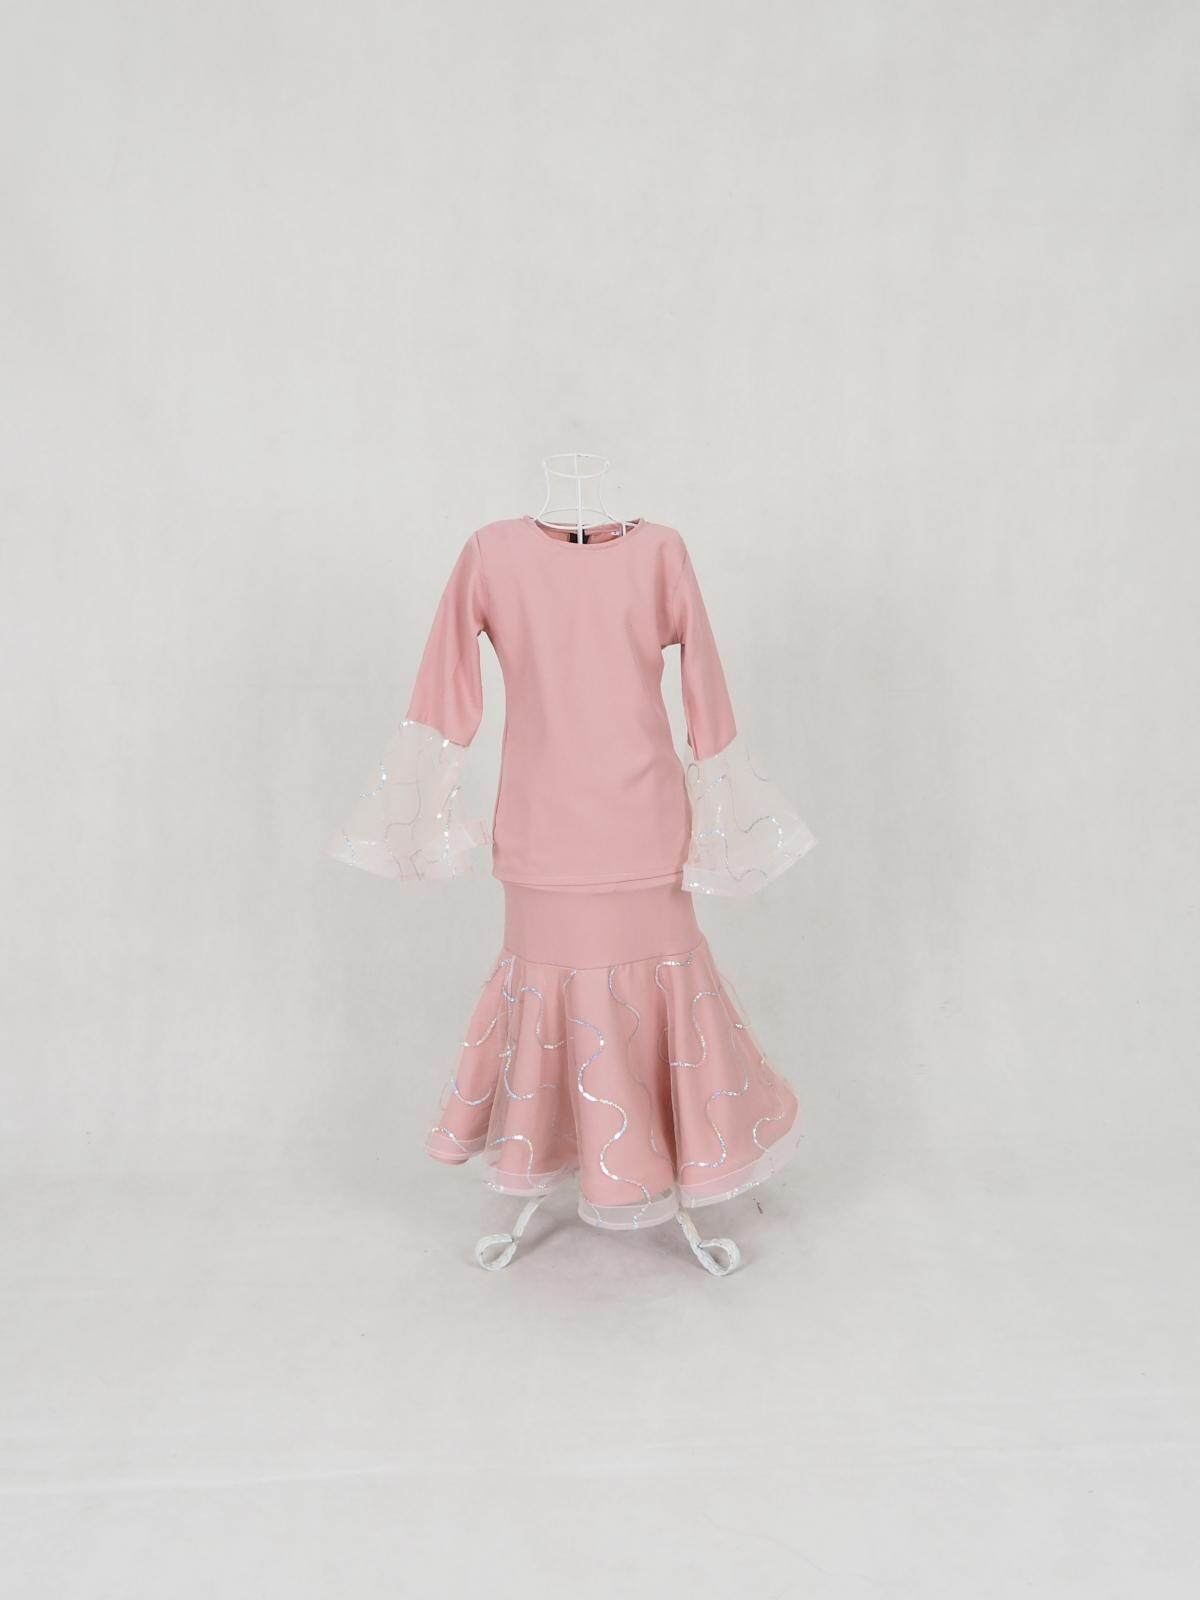 Muslim Kid Chiffon Budak Baju Kurung / Misra Chiffon Bling Baju Kurung Kid (7-12Years) / Girls Dresses / Kanak-Kanak / Raya 2020 / Ready Stock / Murah / Ship from Malaysia / Hot Product